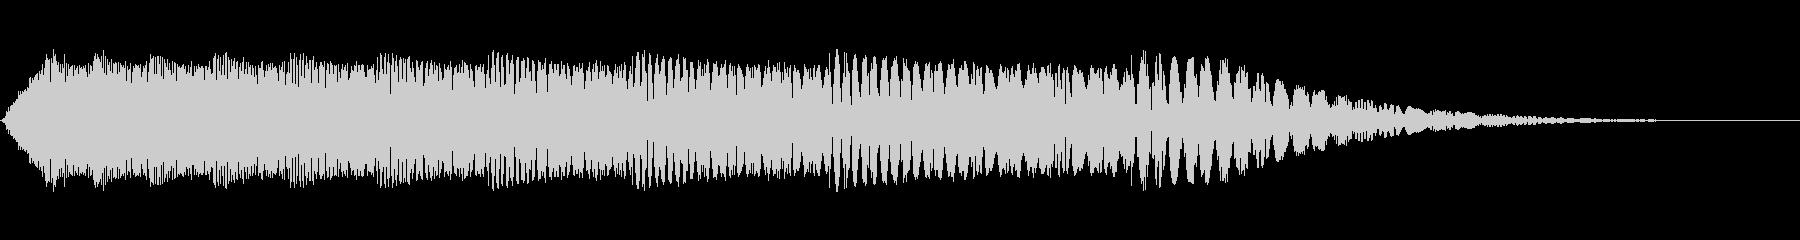 STACCATO LASER HIT 3の未再生の波形